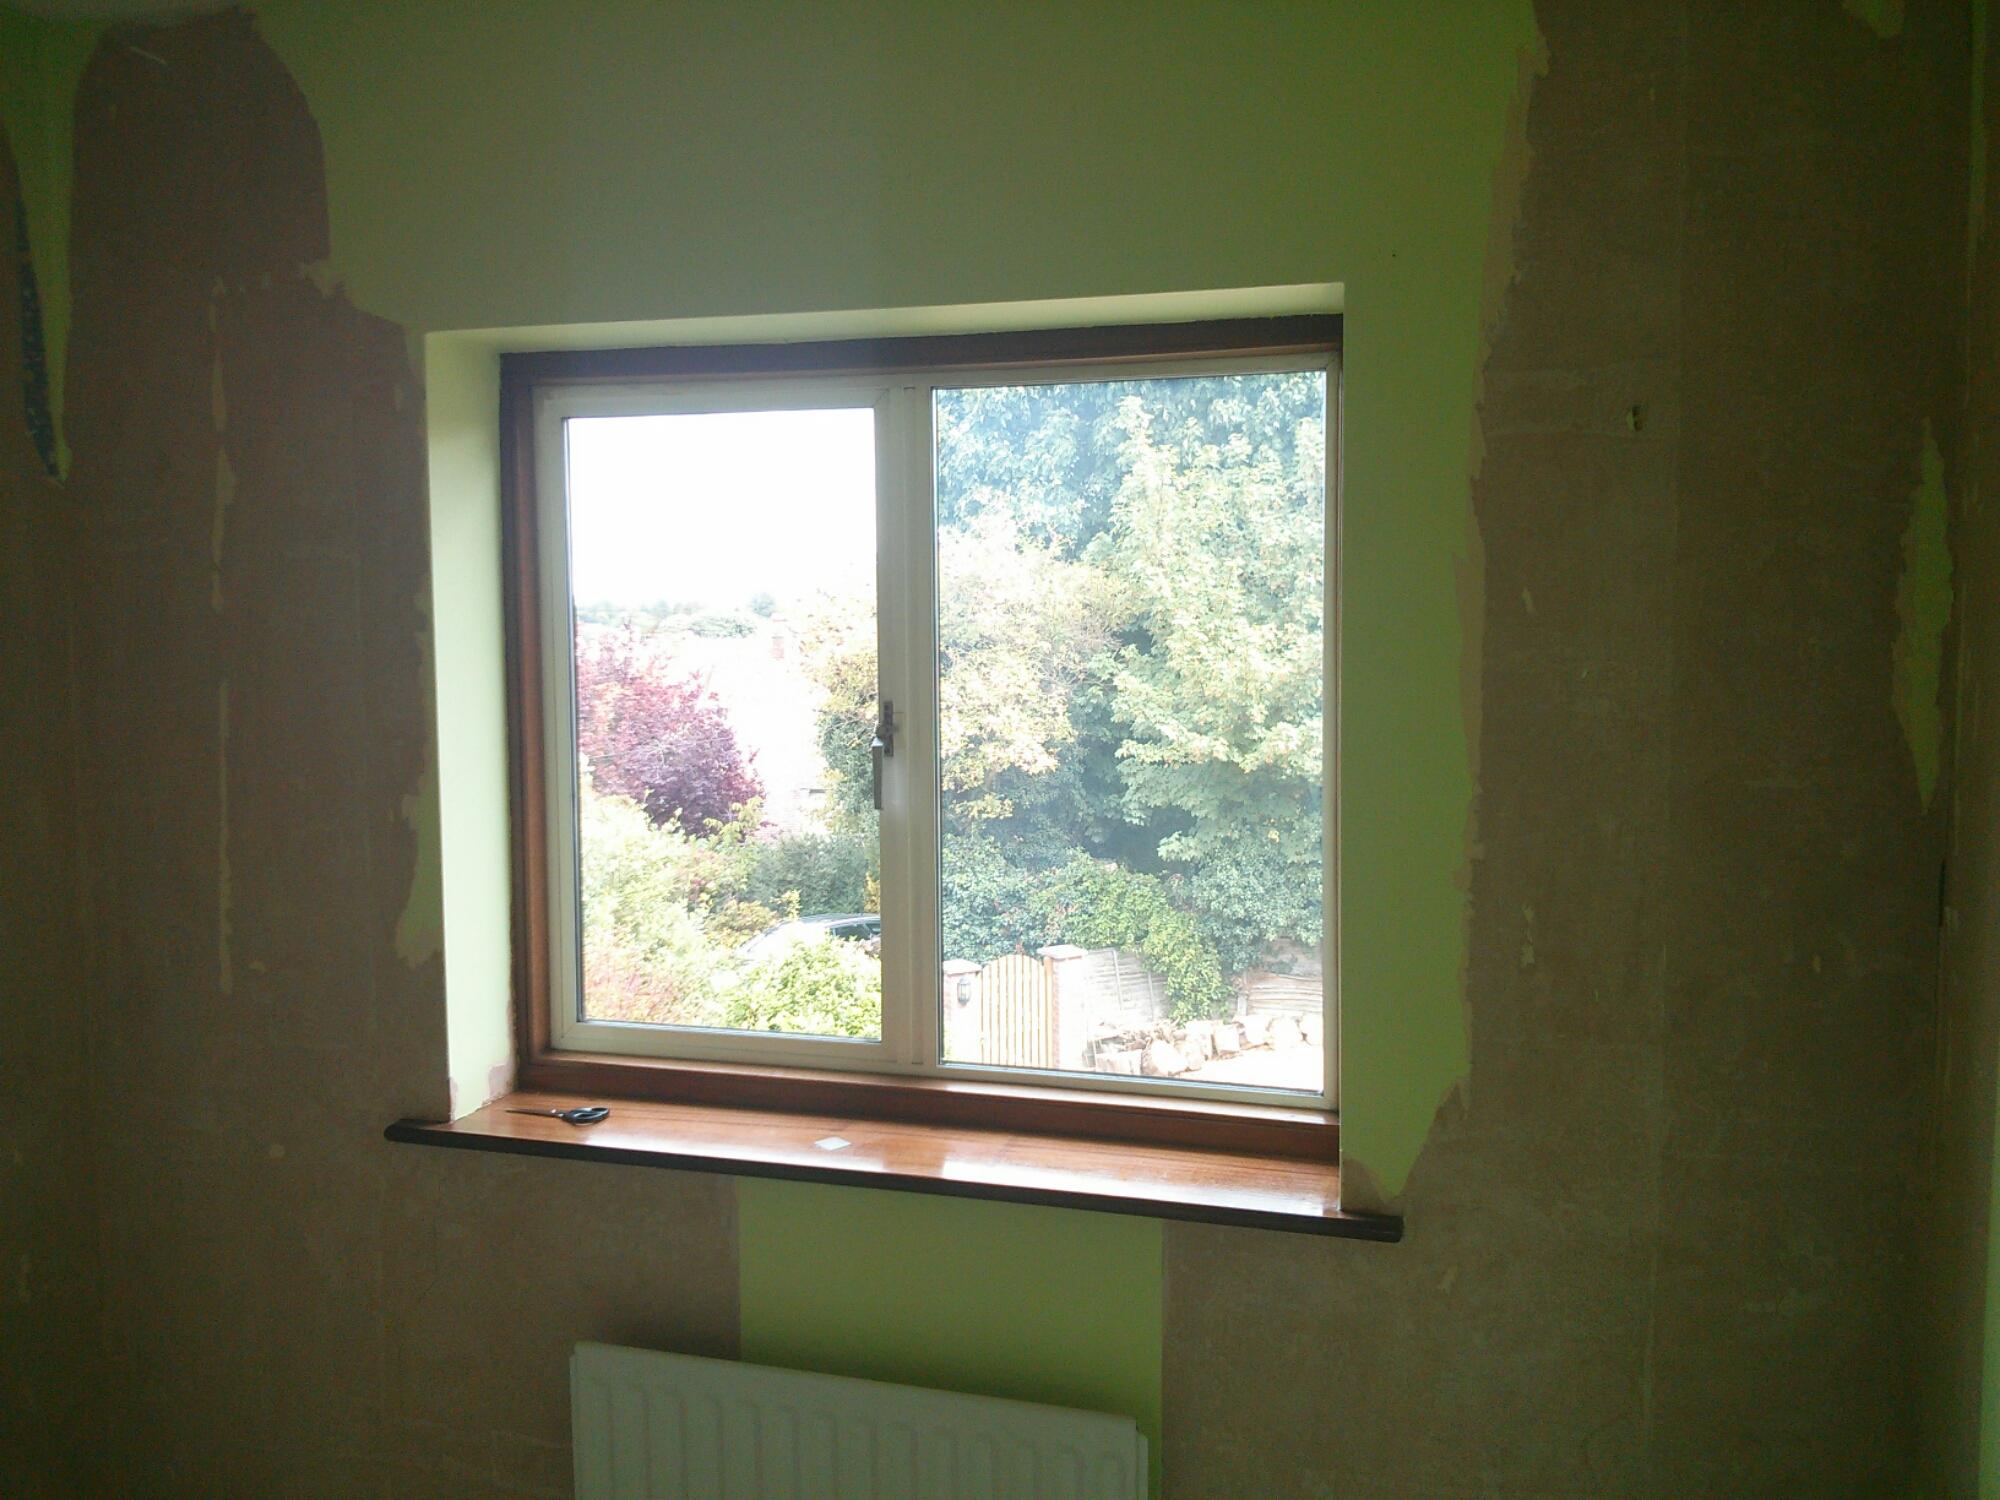 Last vestiges of green wallpaper